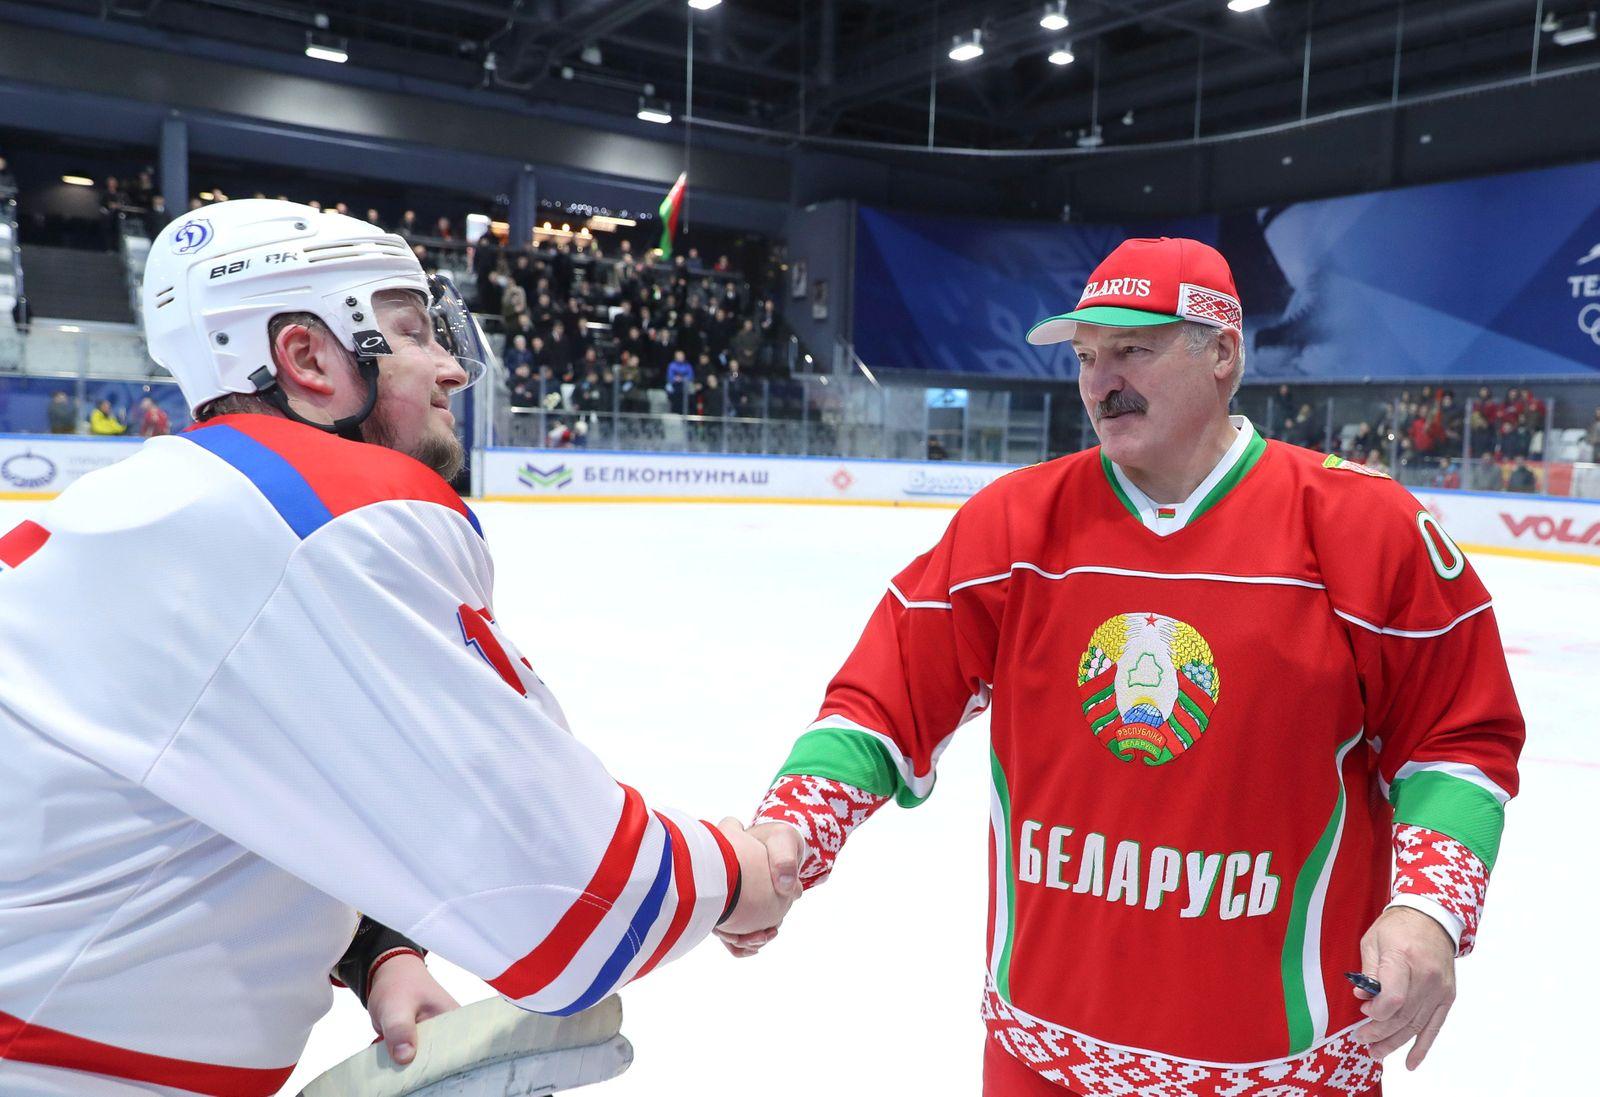 Belarusian President Alexander Lukashenko takes part in an amateur ice hockey game in Minsk